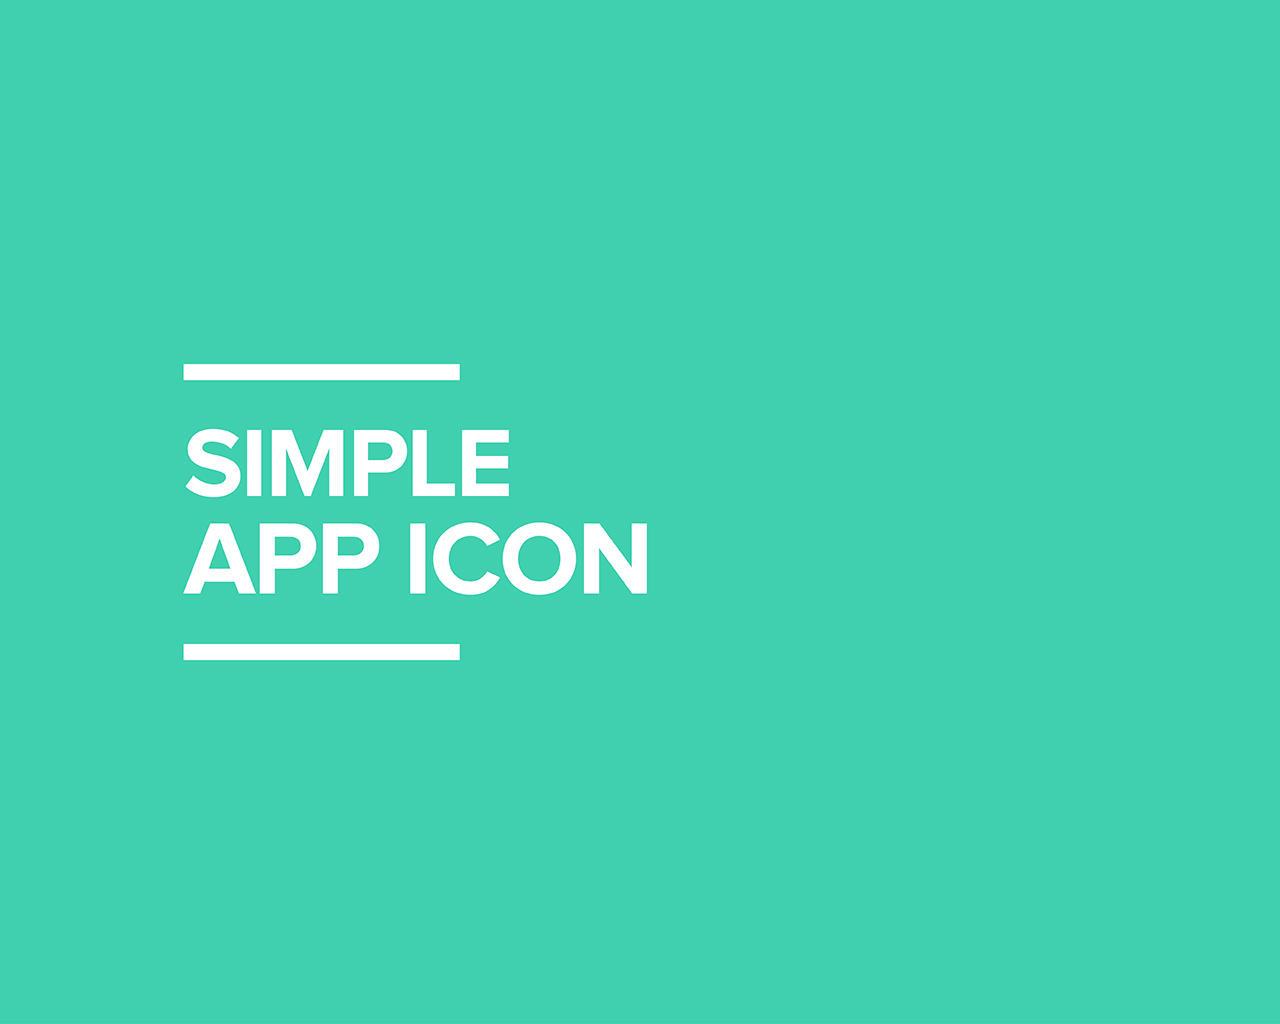 Simple App Icon By 8z On Envato Studio